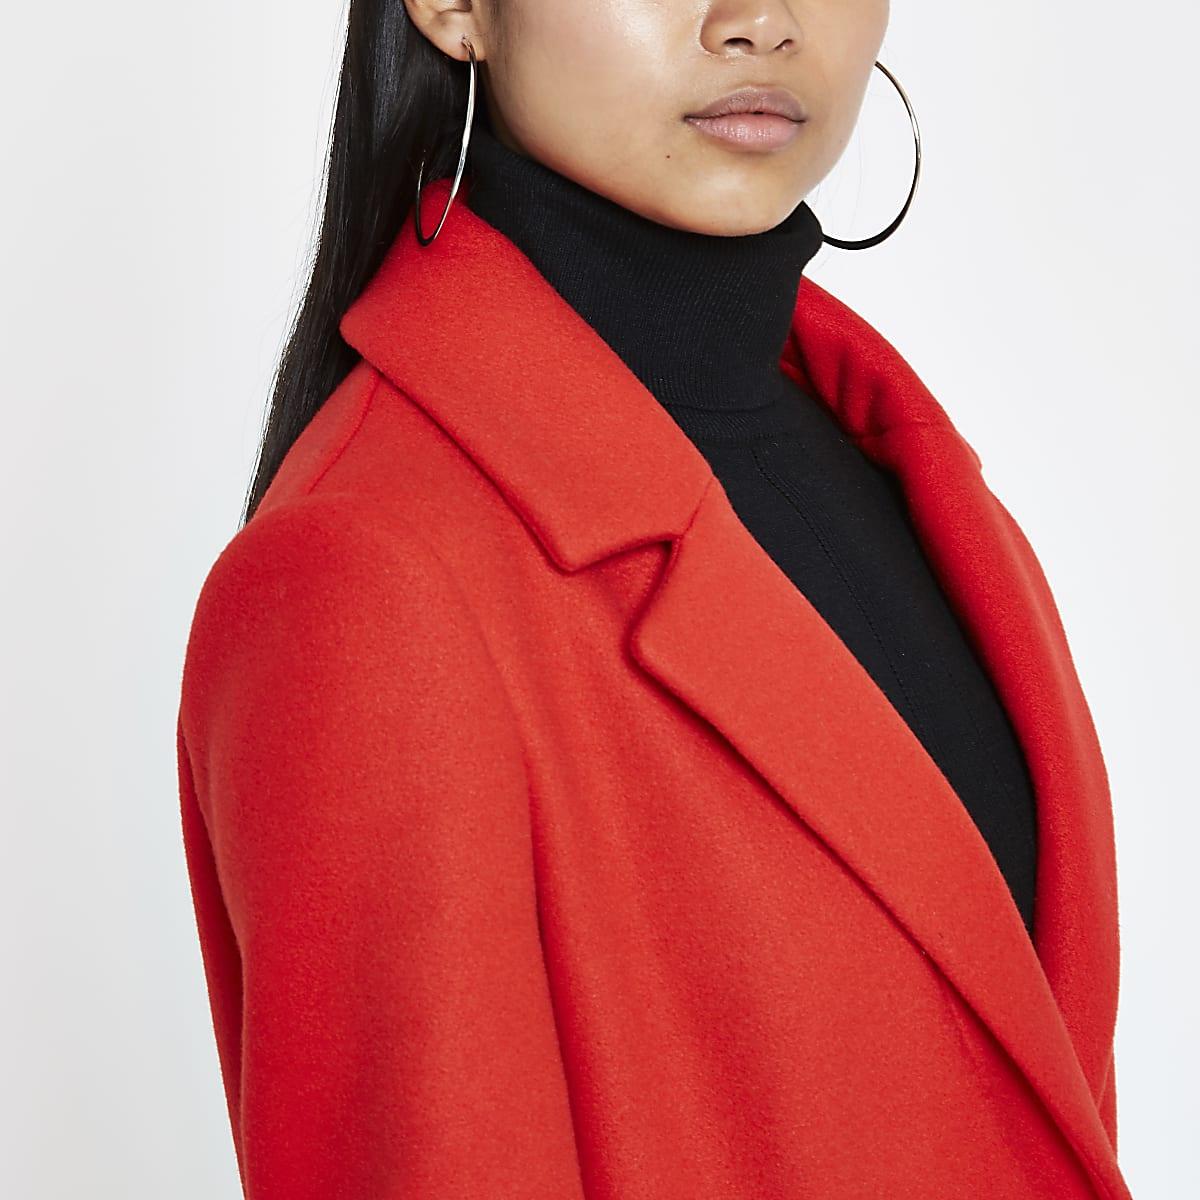 6a6e7caa32f Petite red single breasted longline coat - Coats - Coats & Jackets ...